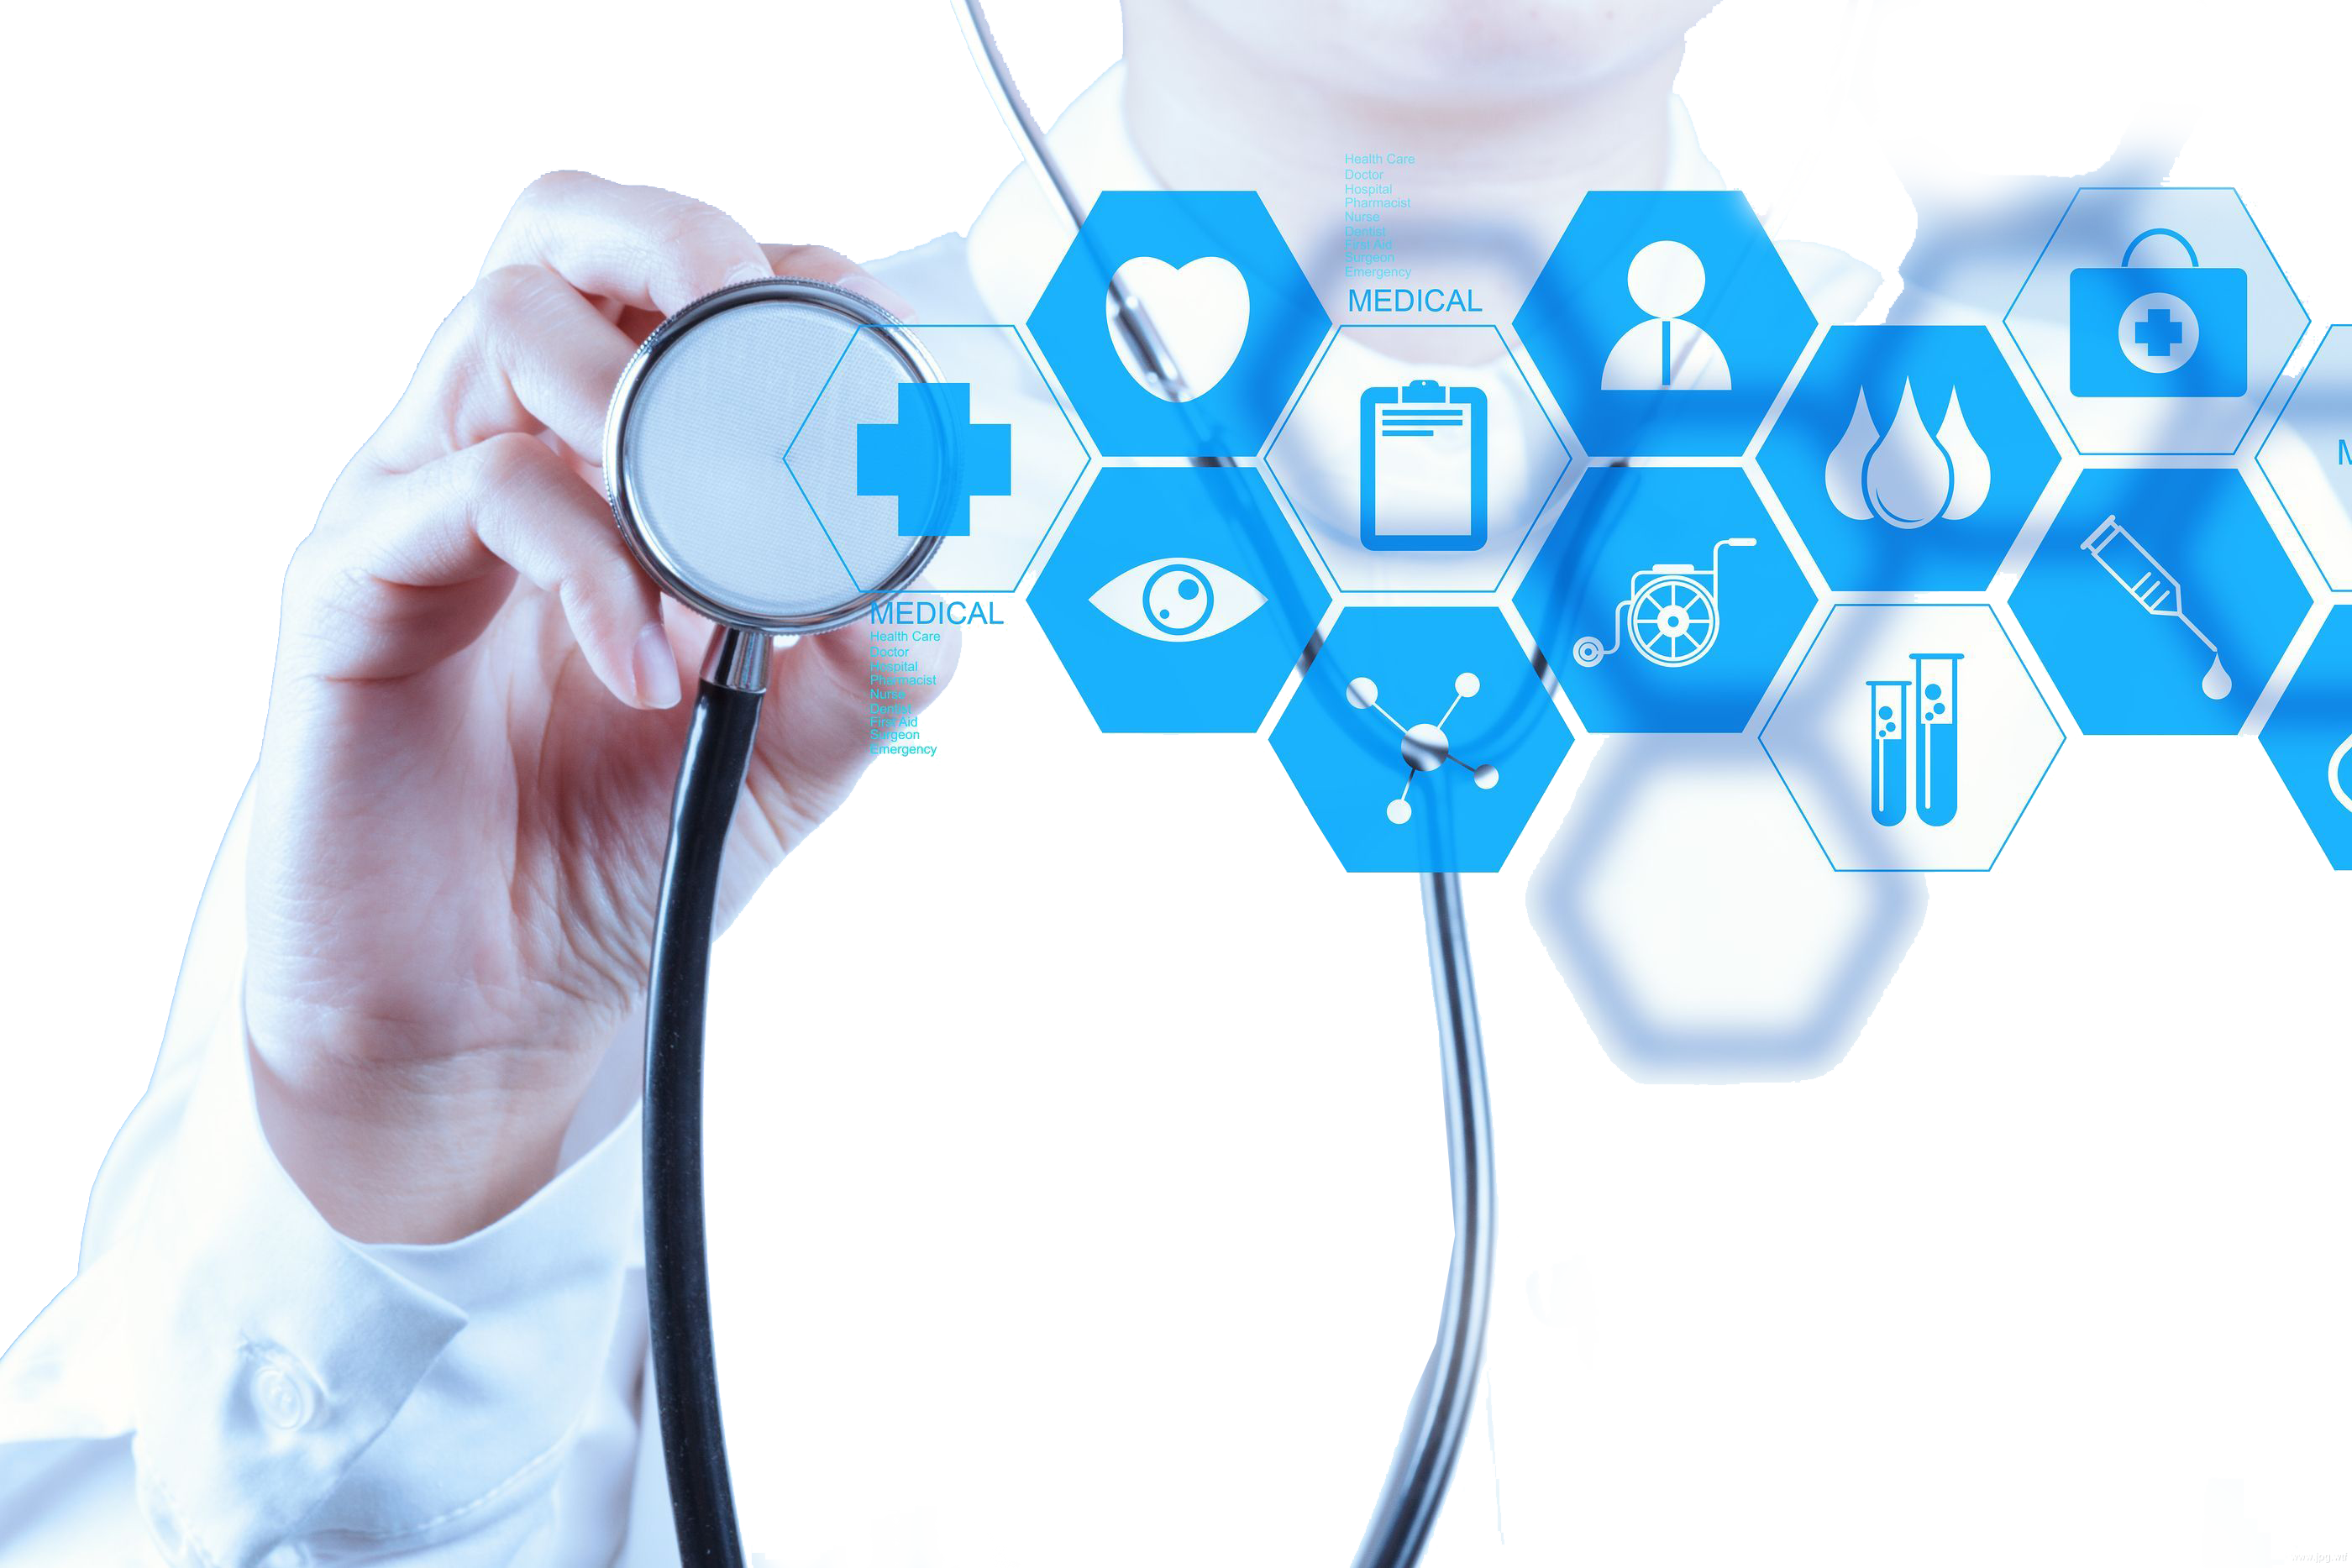 Healthcare clipart medicine background. Health care clinic therapy